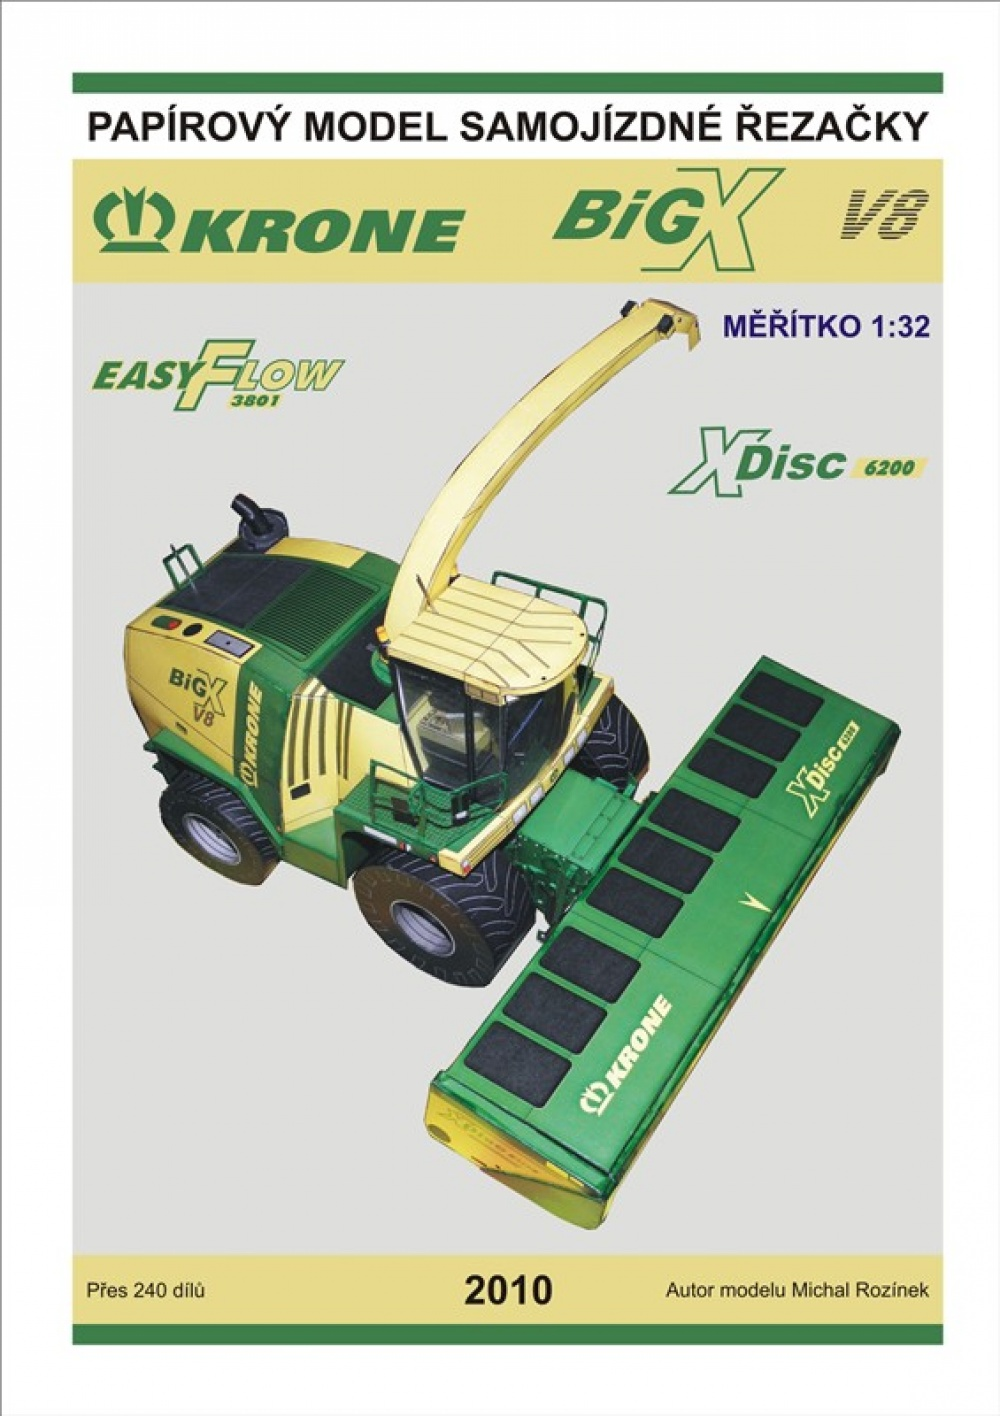 KRONE Big X V8 samojízdná řezačka